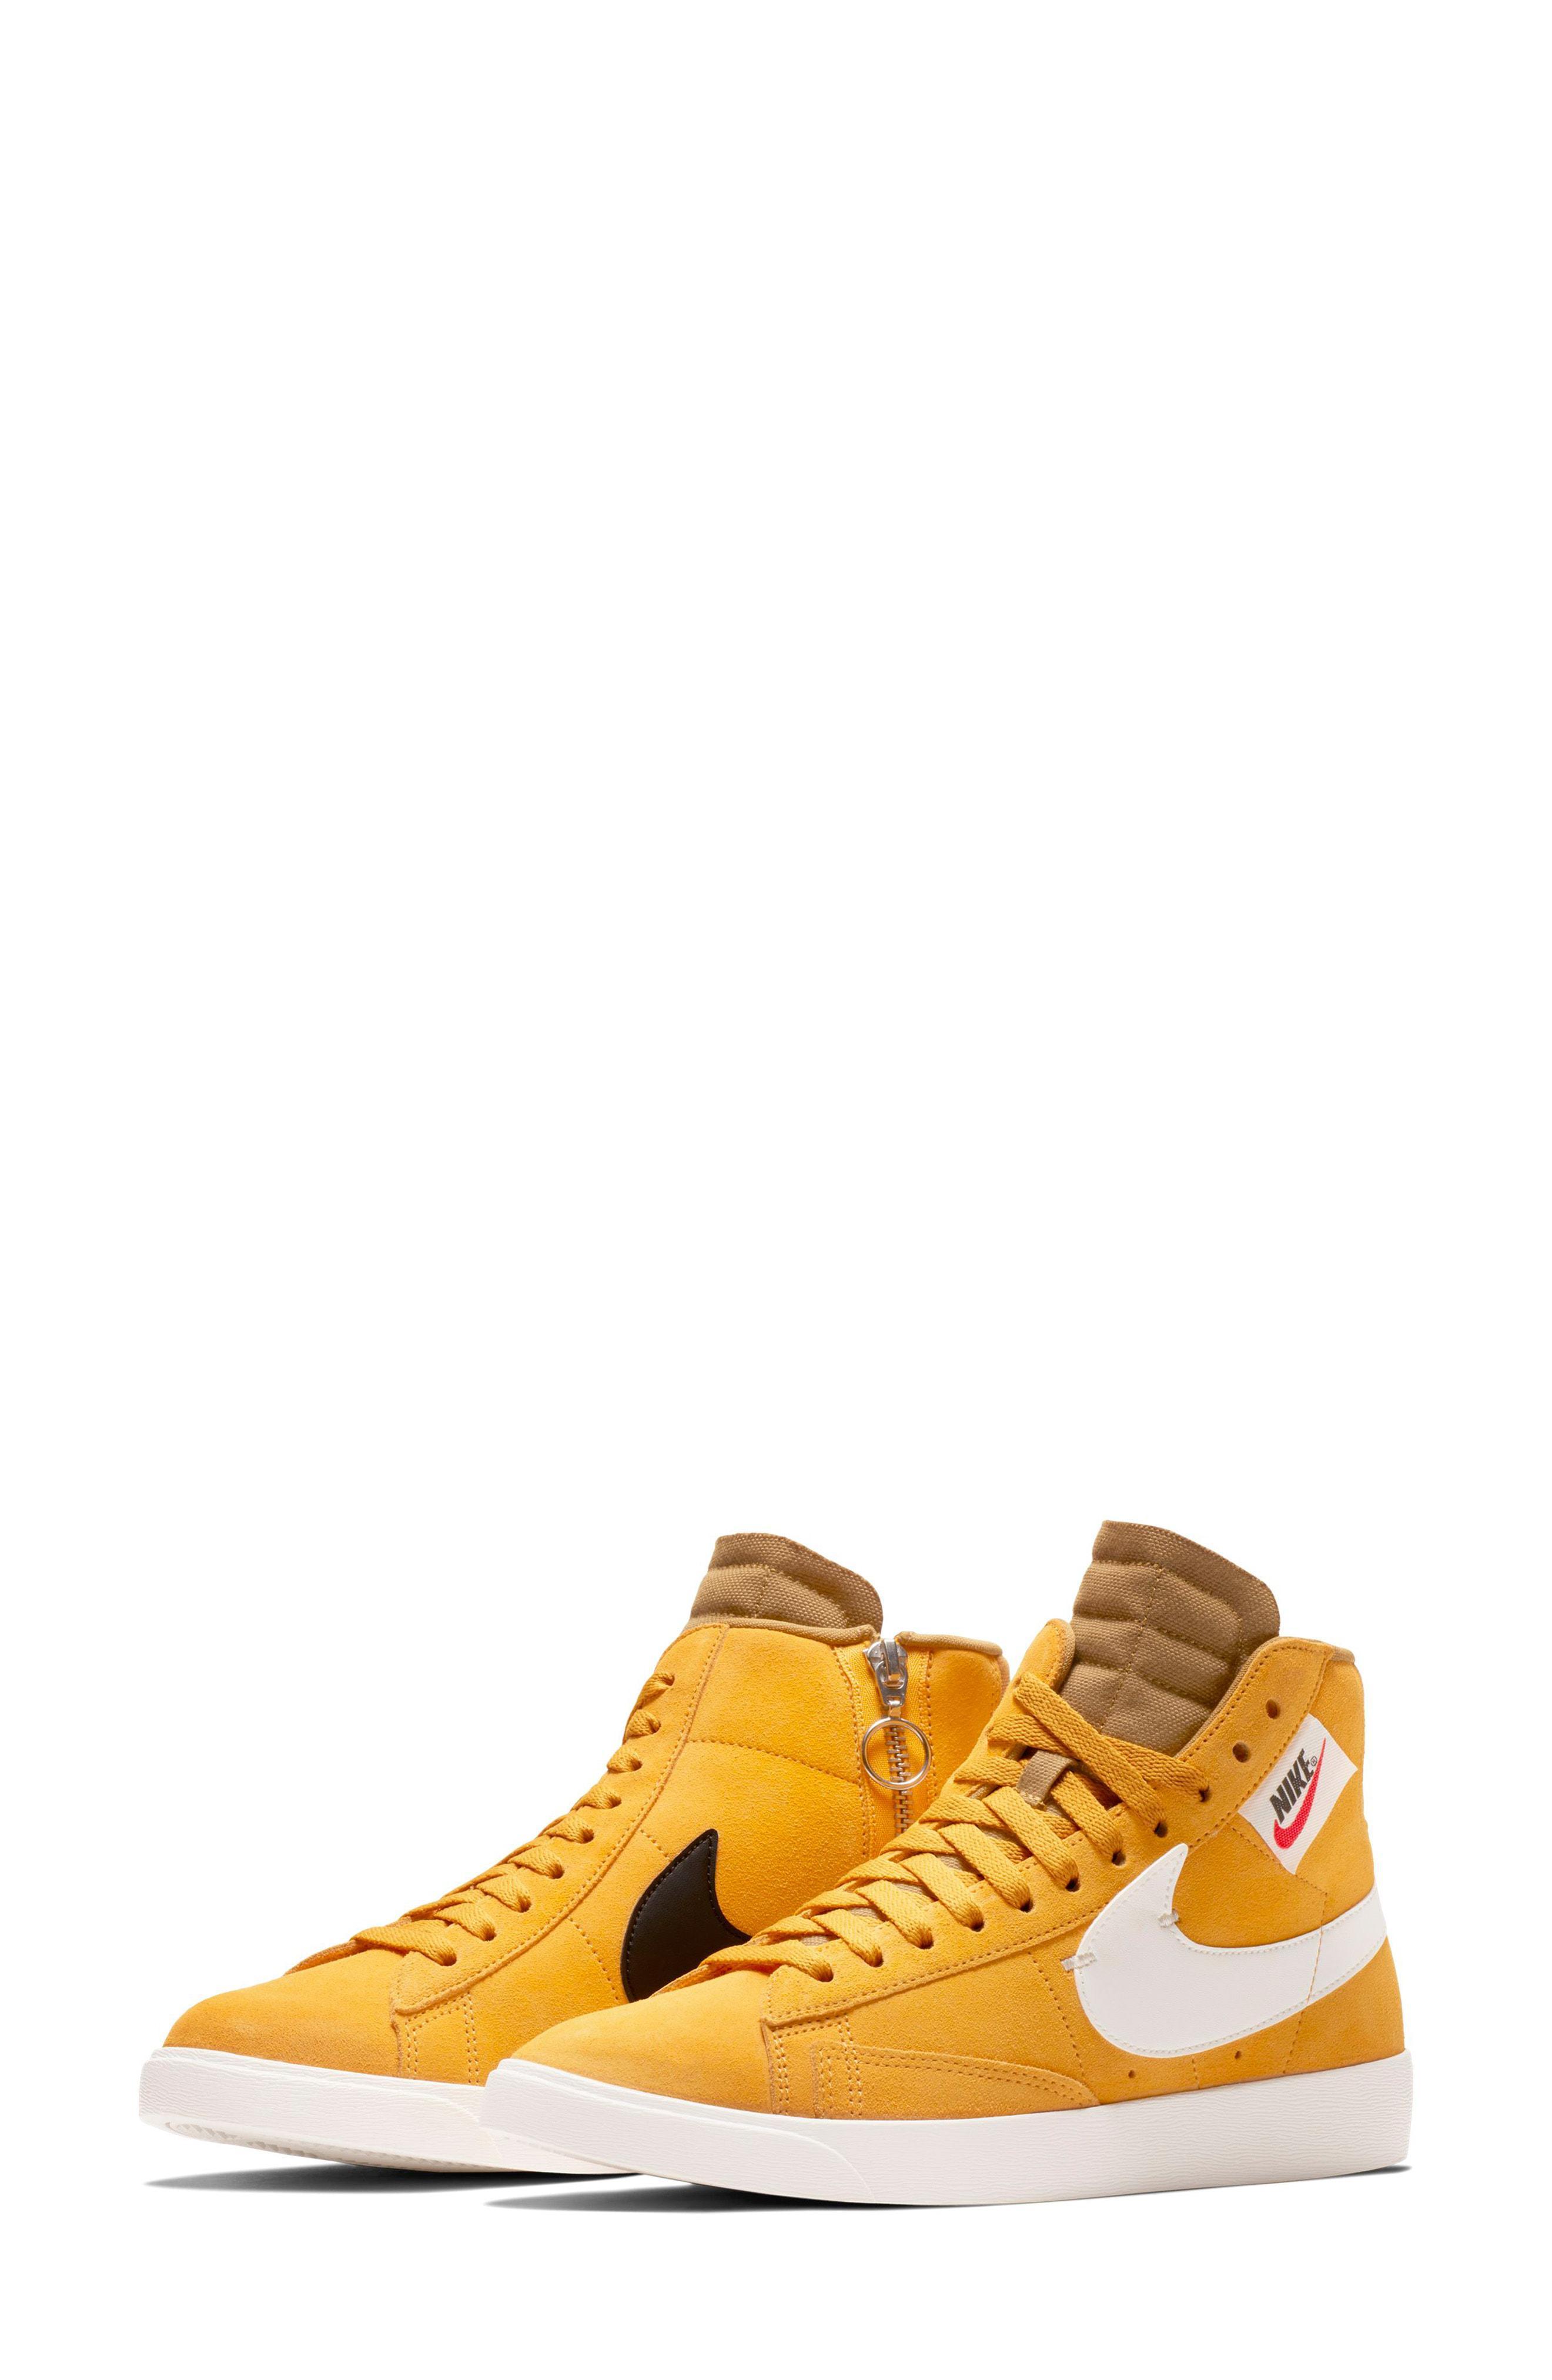 huge discount 90b6c 3ef21 Nike Blazer Mid Rebel Sneaker in Yellow - Lyst